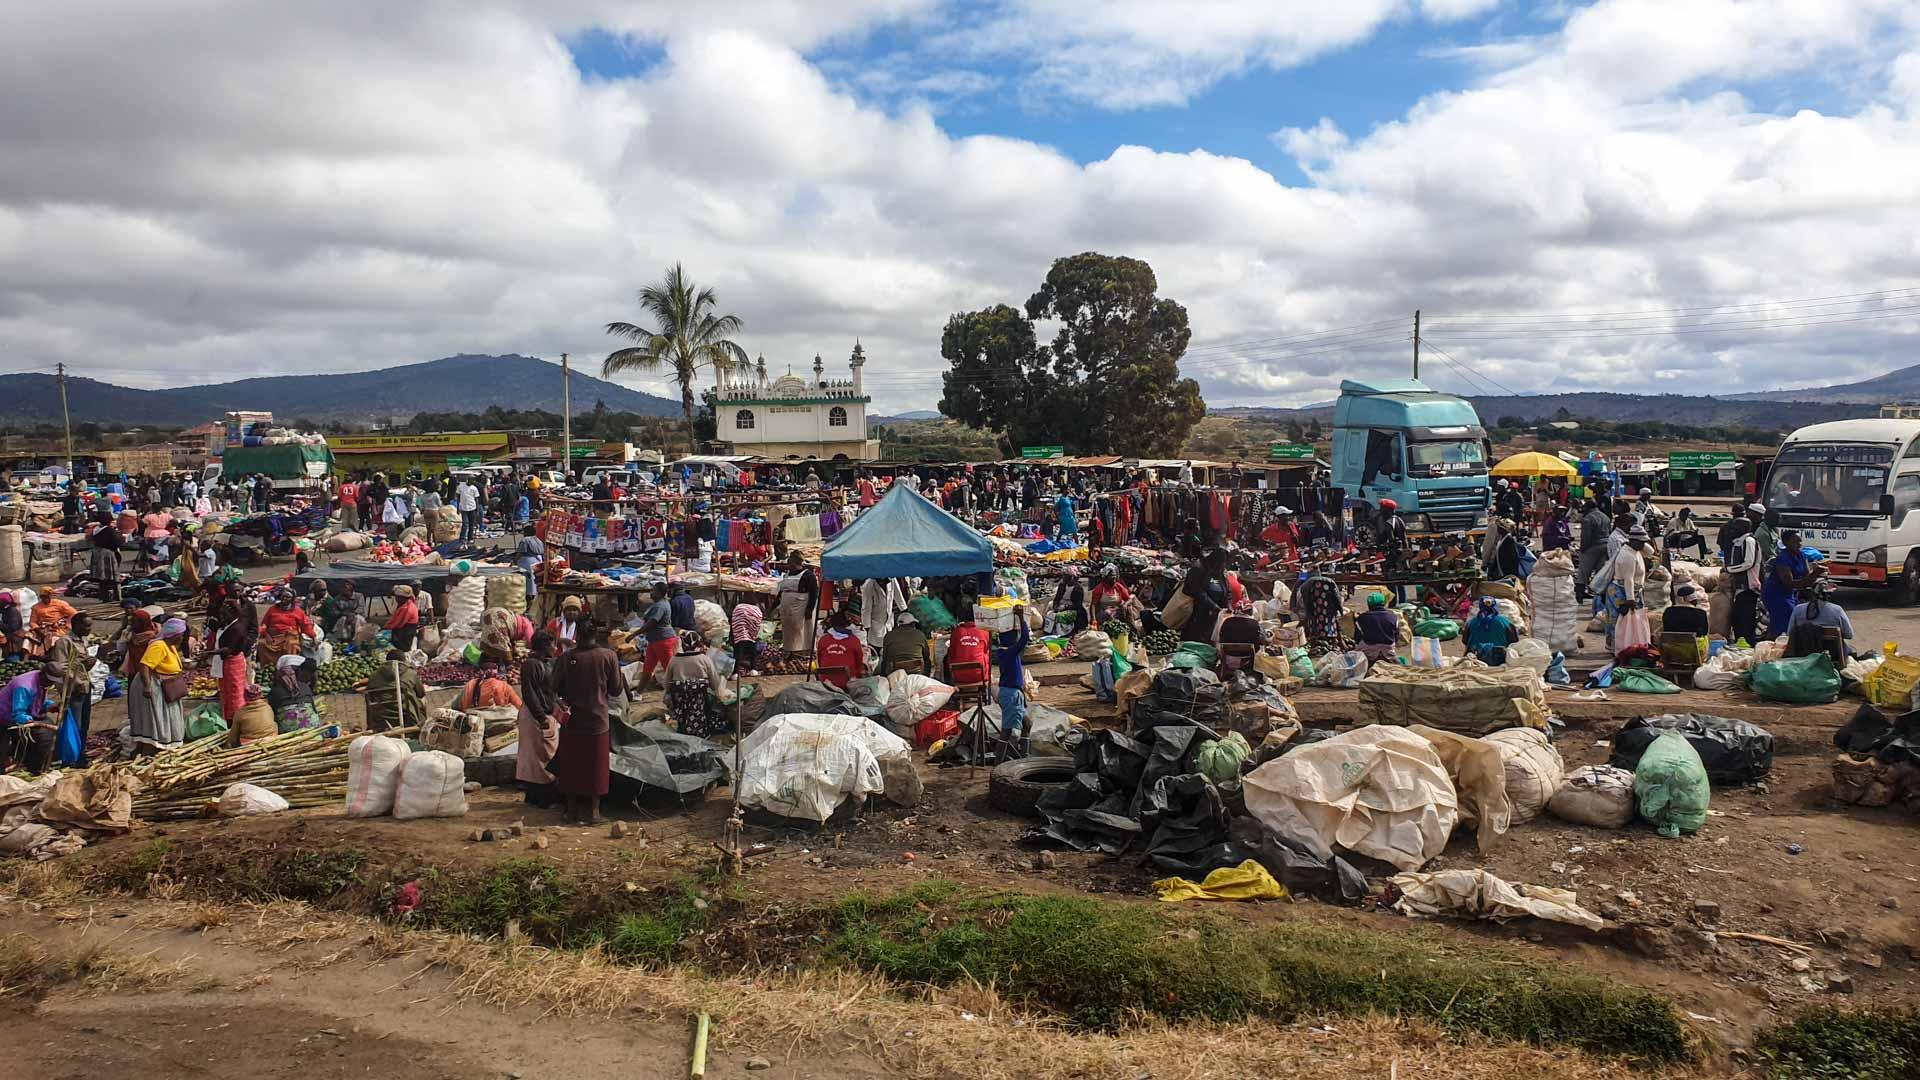 Mercado en la carretera entre Nairobi y Amboseli, Kenia